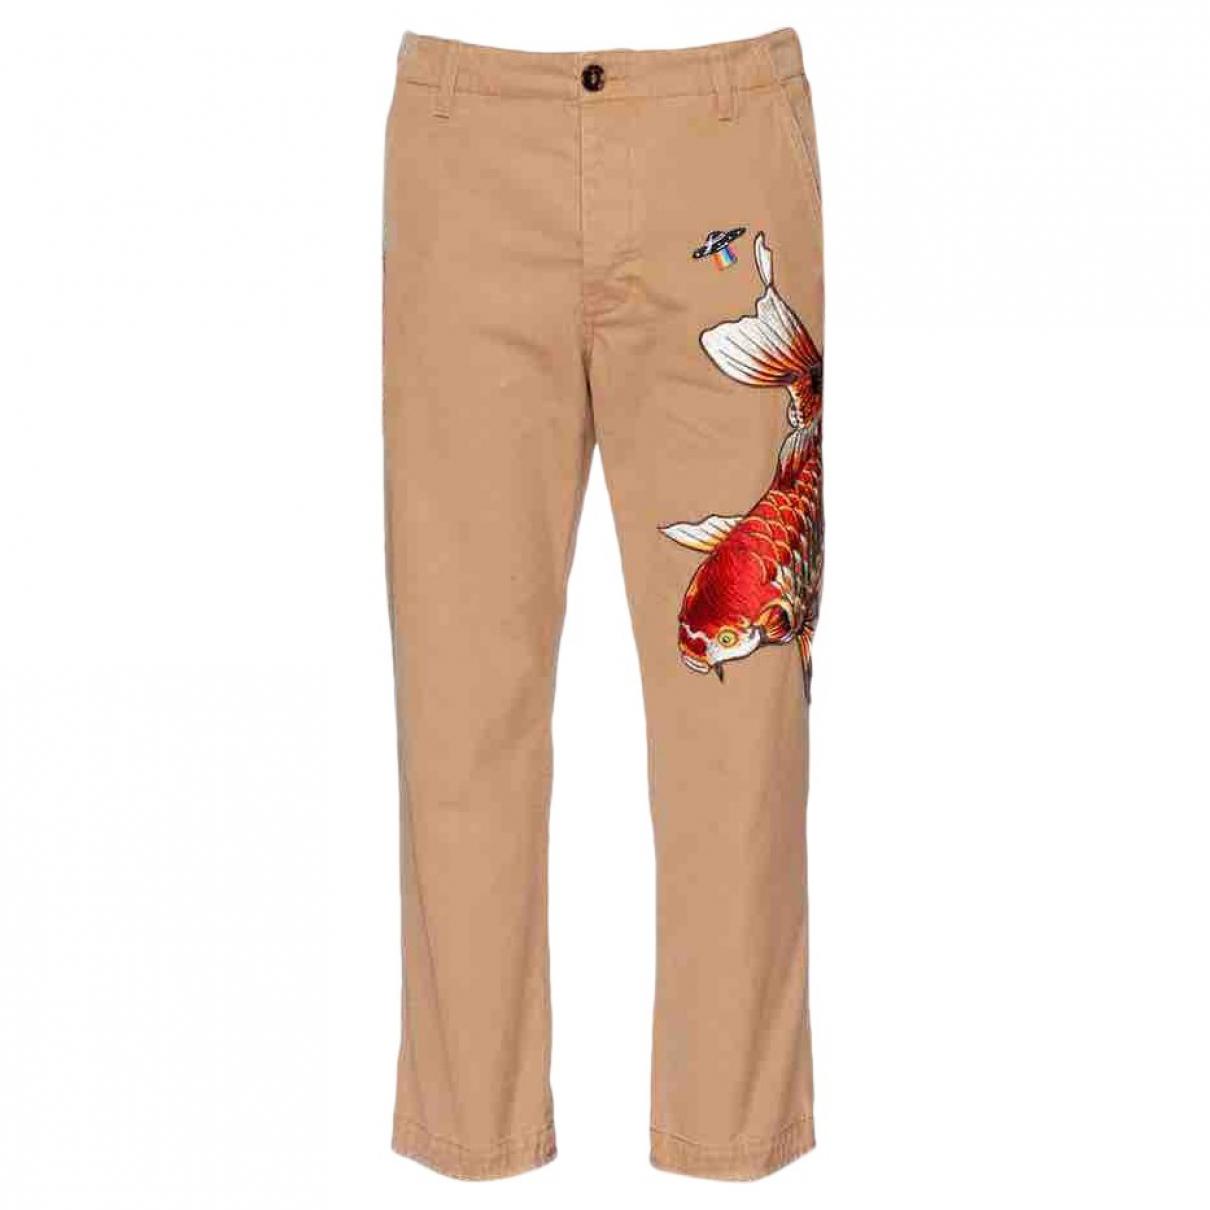 Pantalones en Algodon Beige Gucci